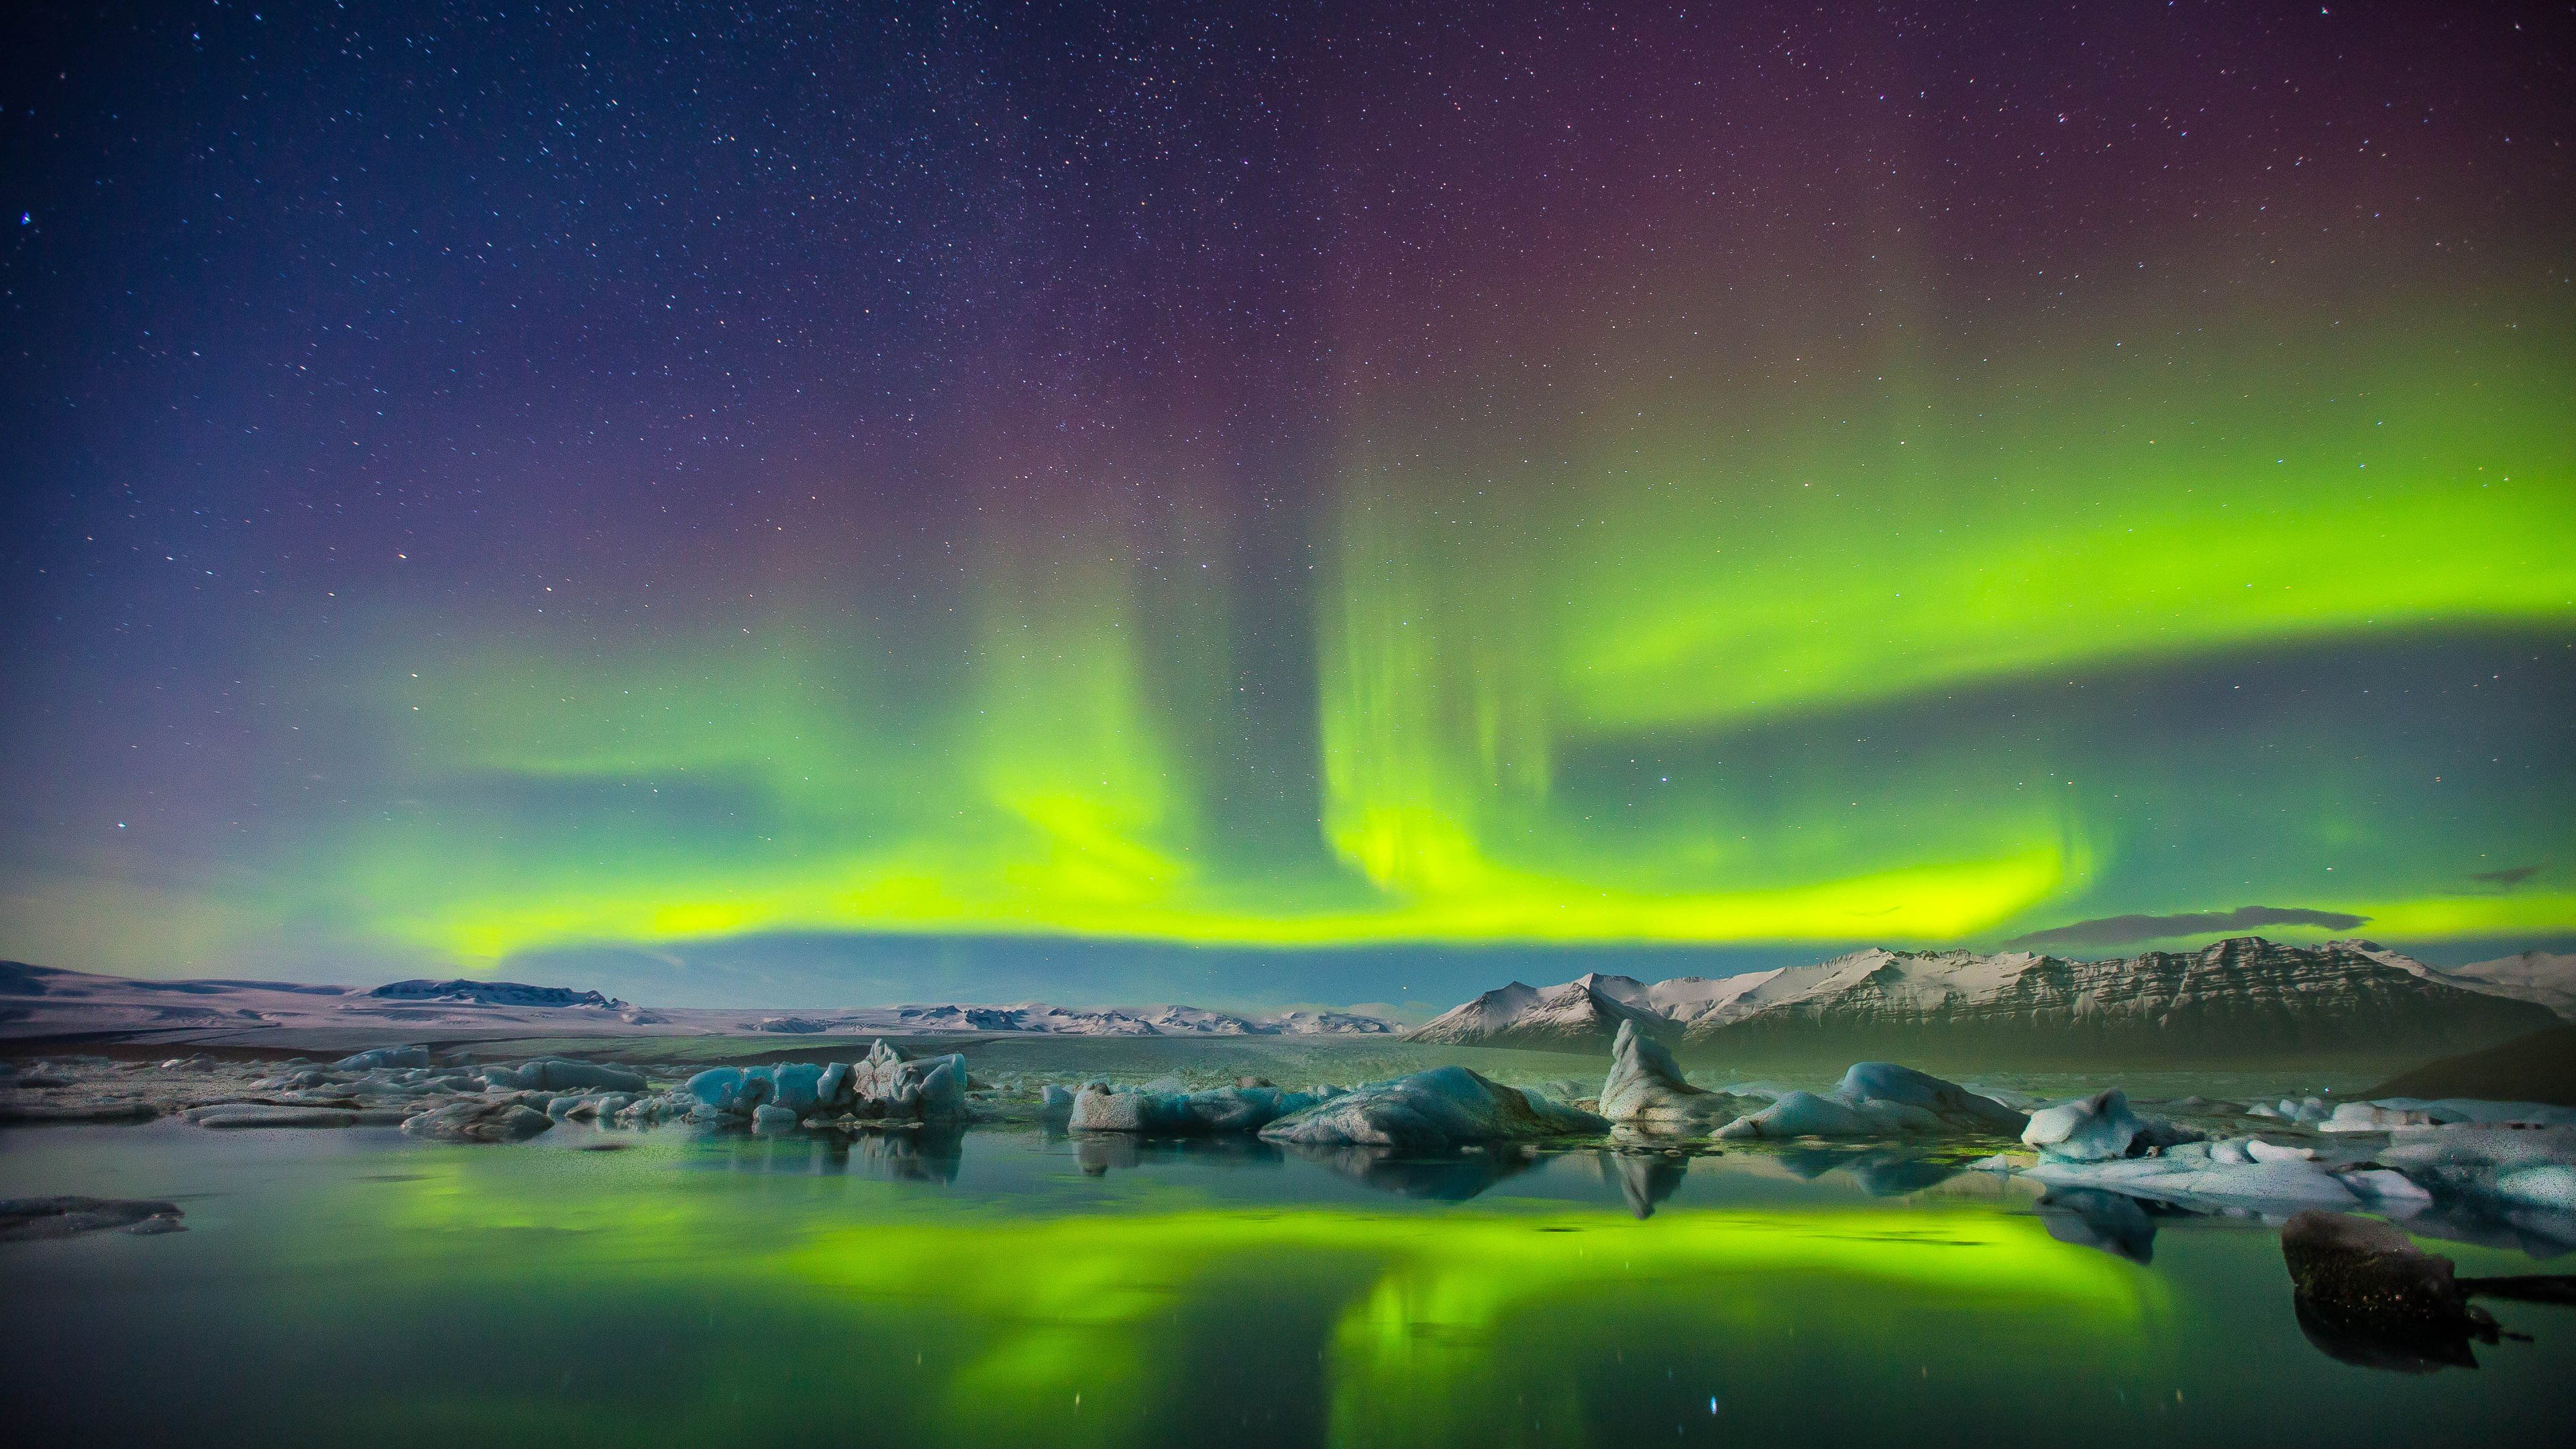 aurora borealis hd wallpapers backgrounds wallpaper hd